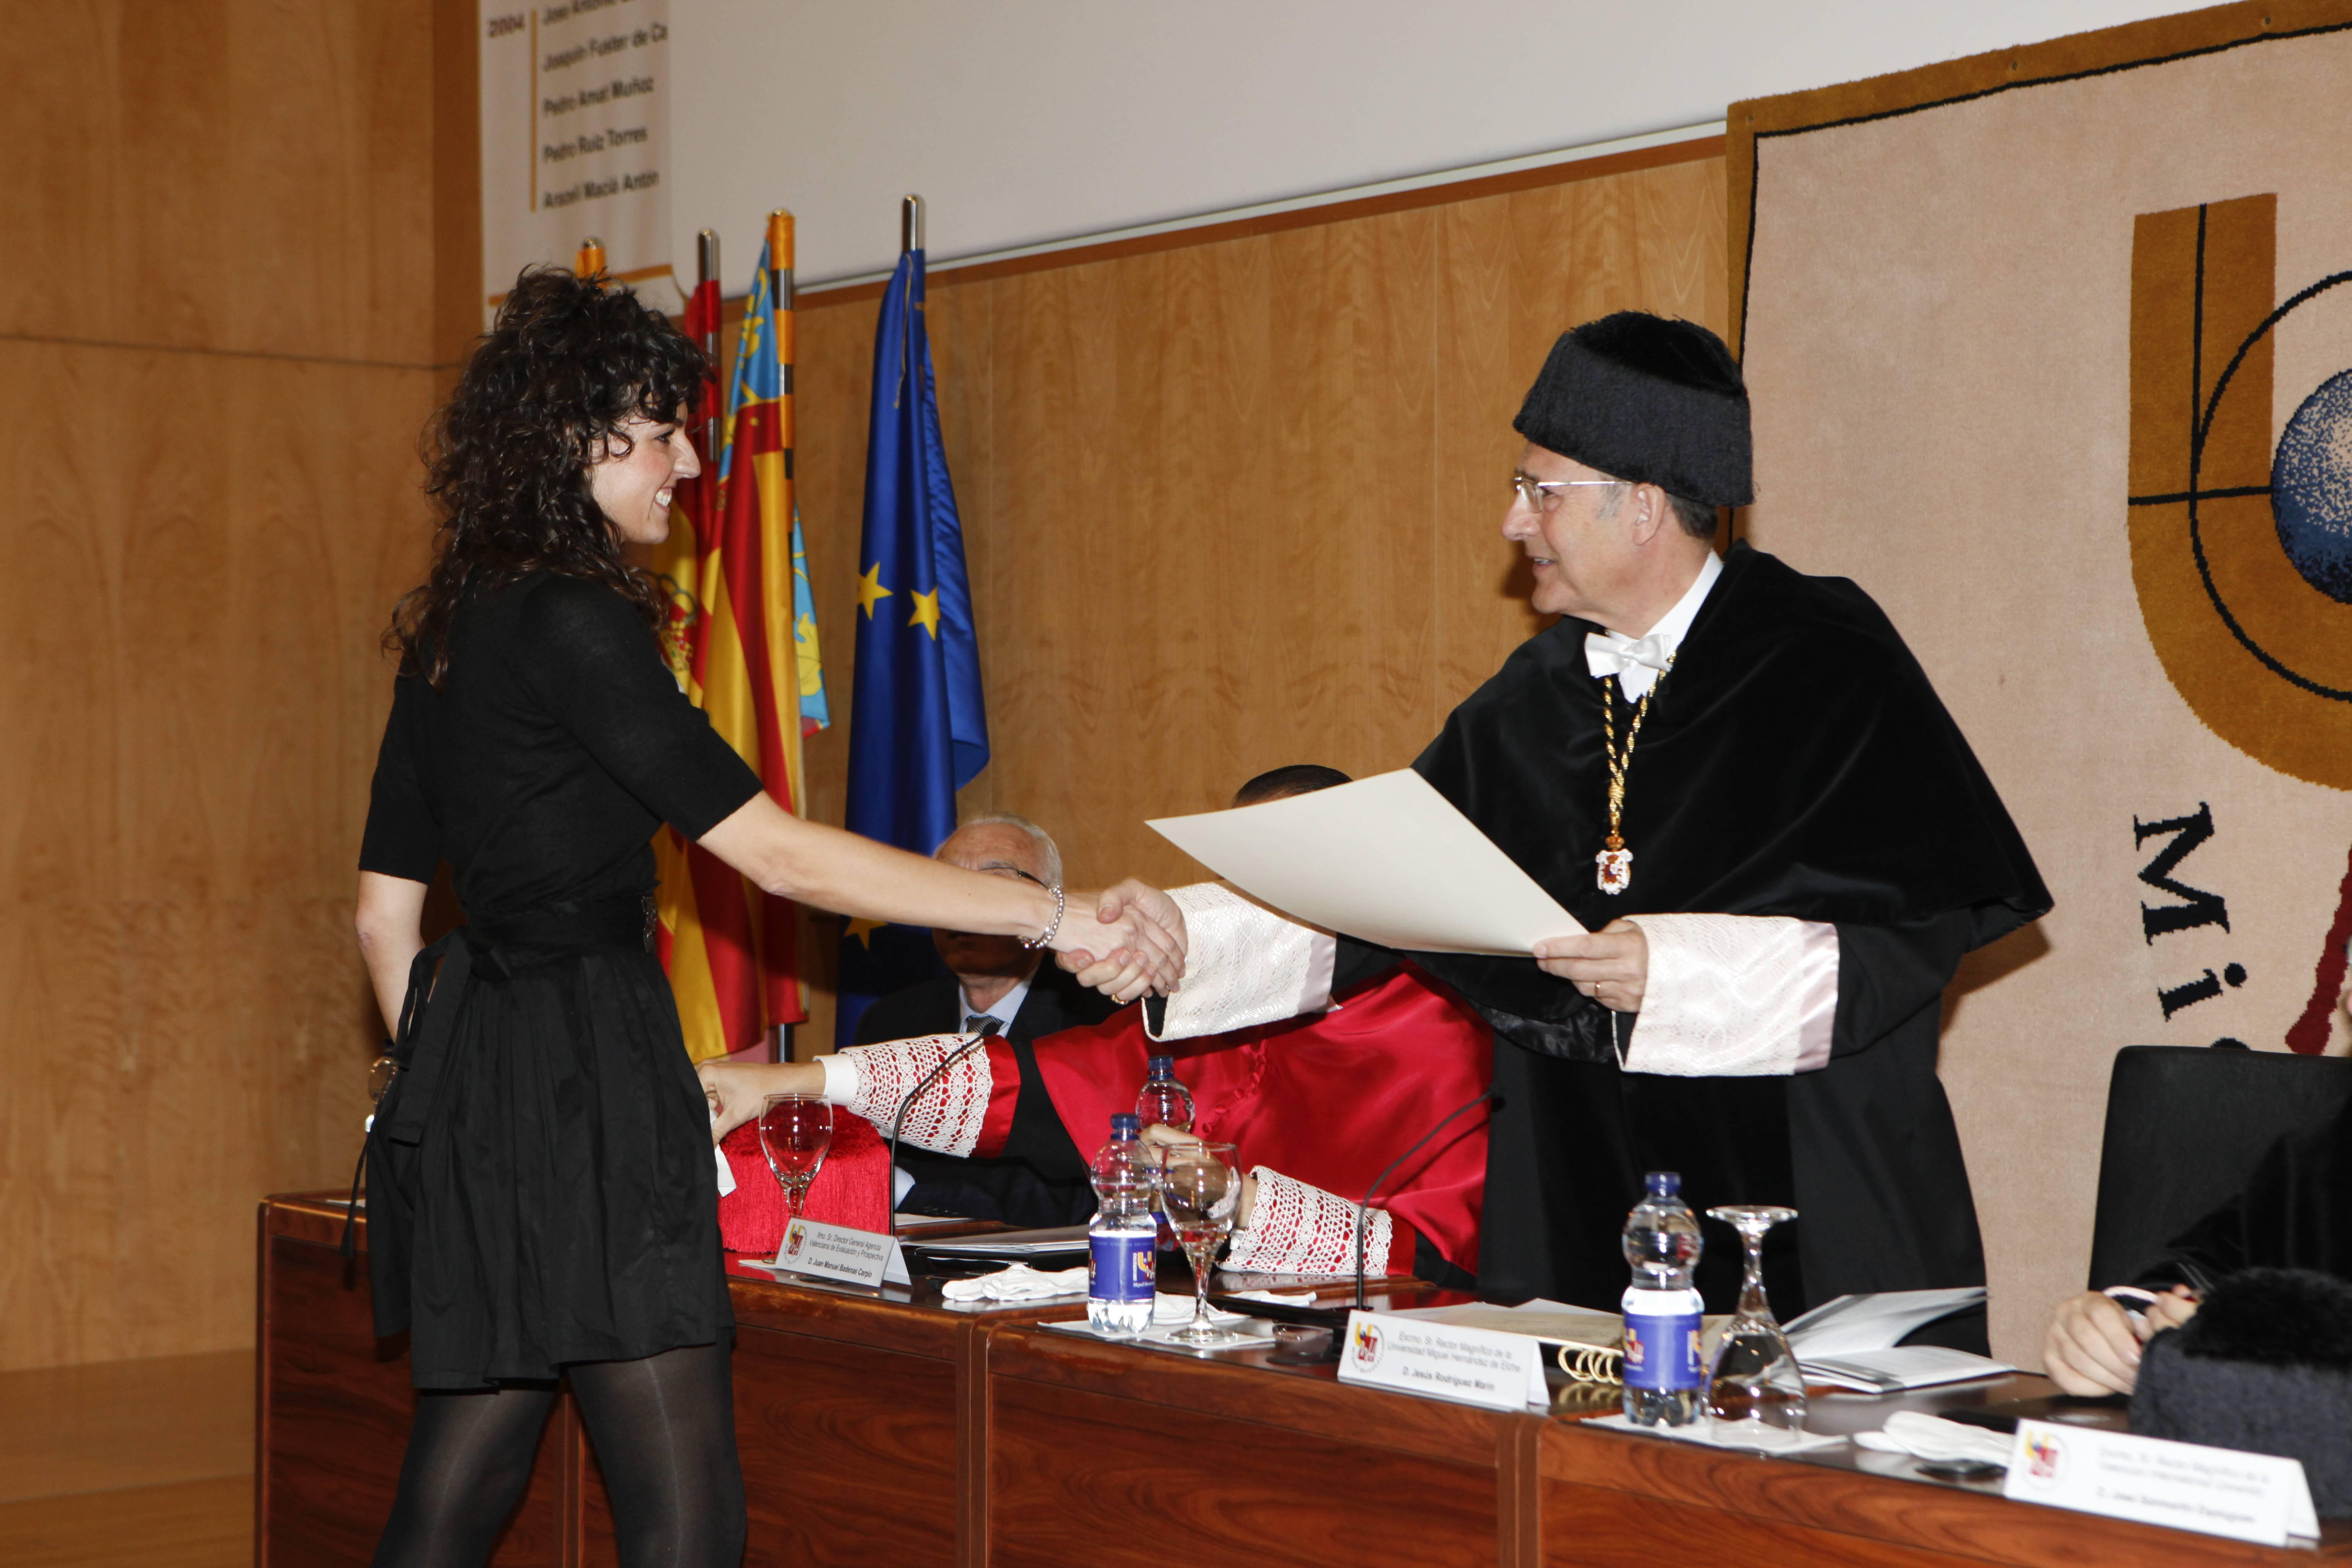 doctor-honoris-causa-luis-gamir_mg_0926.jpg